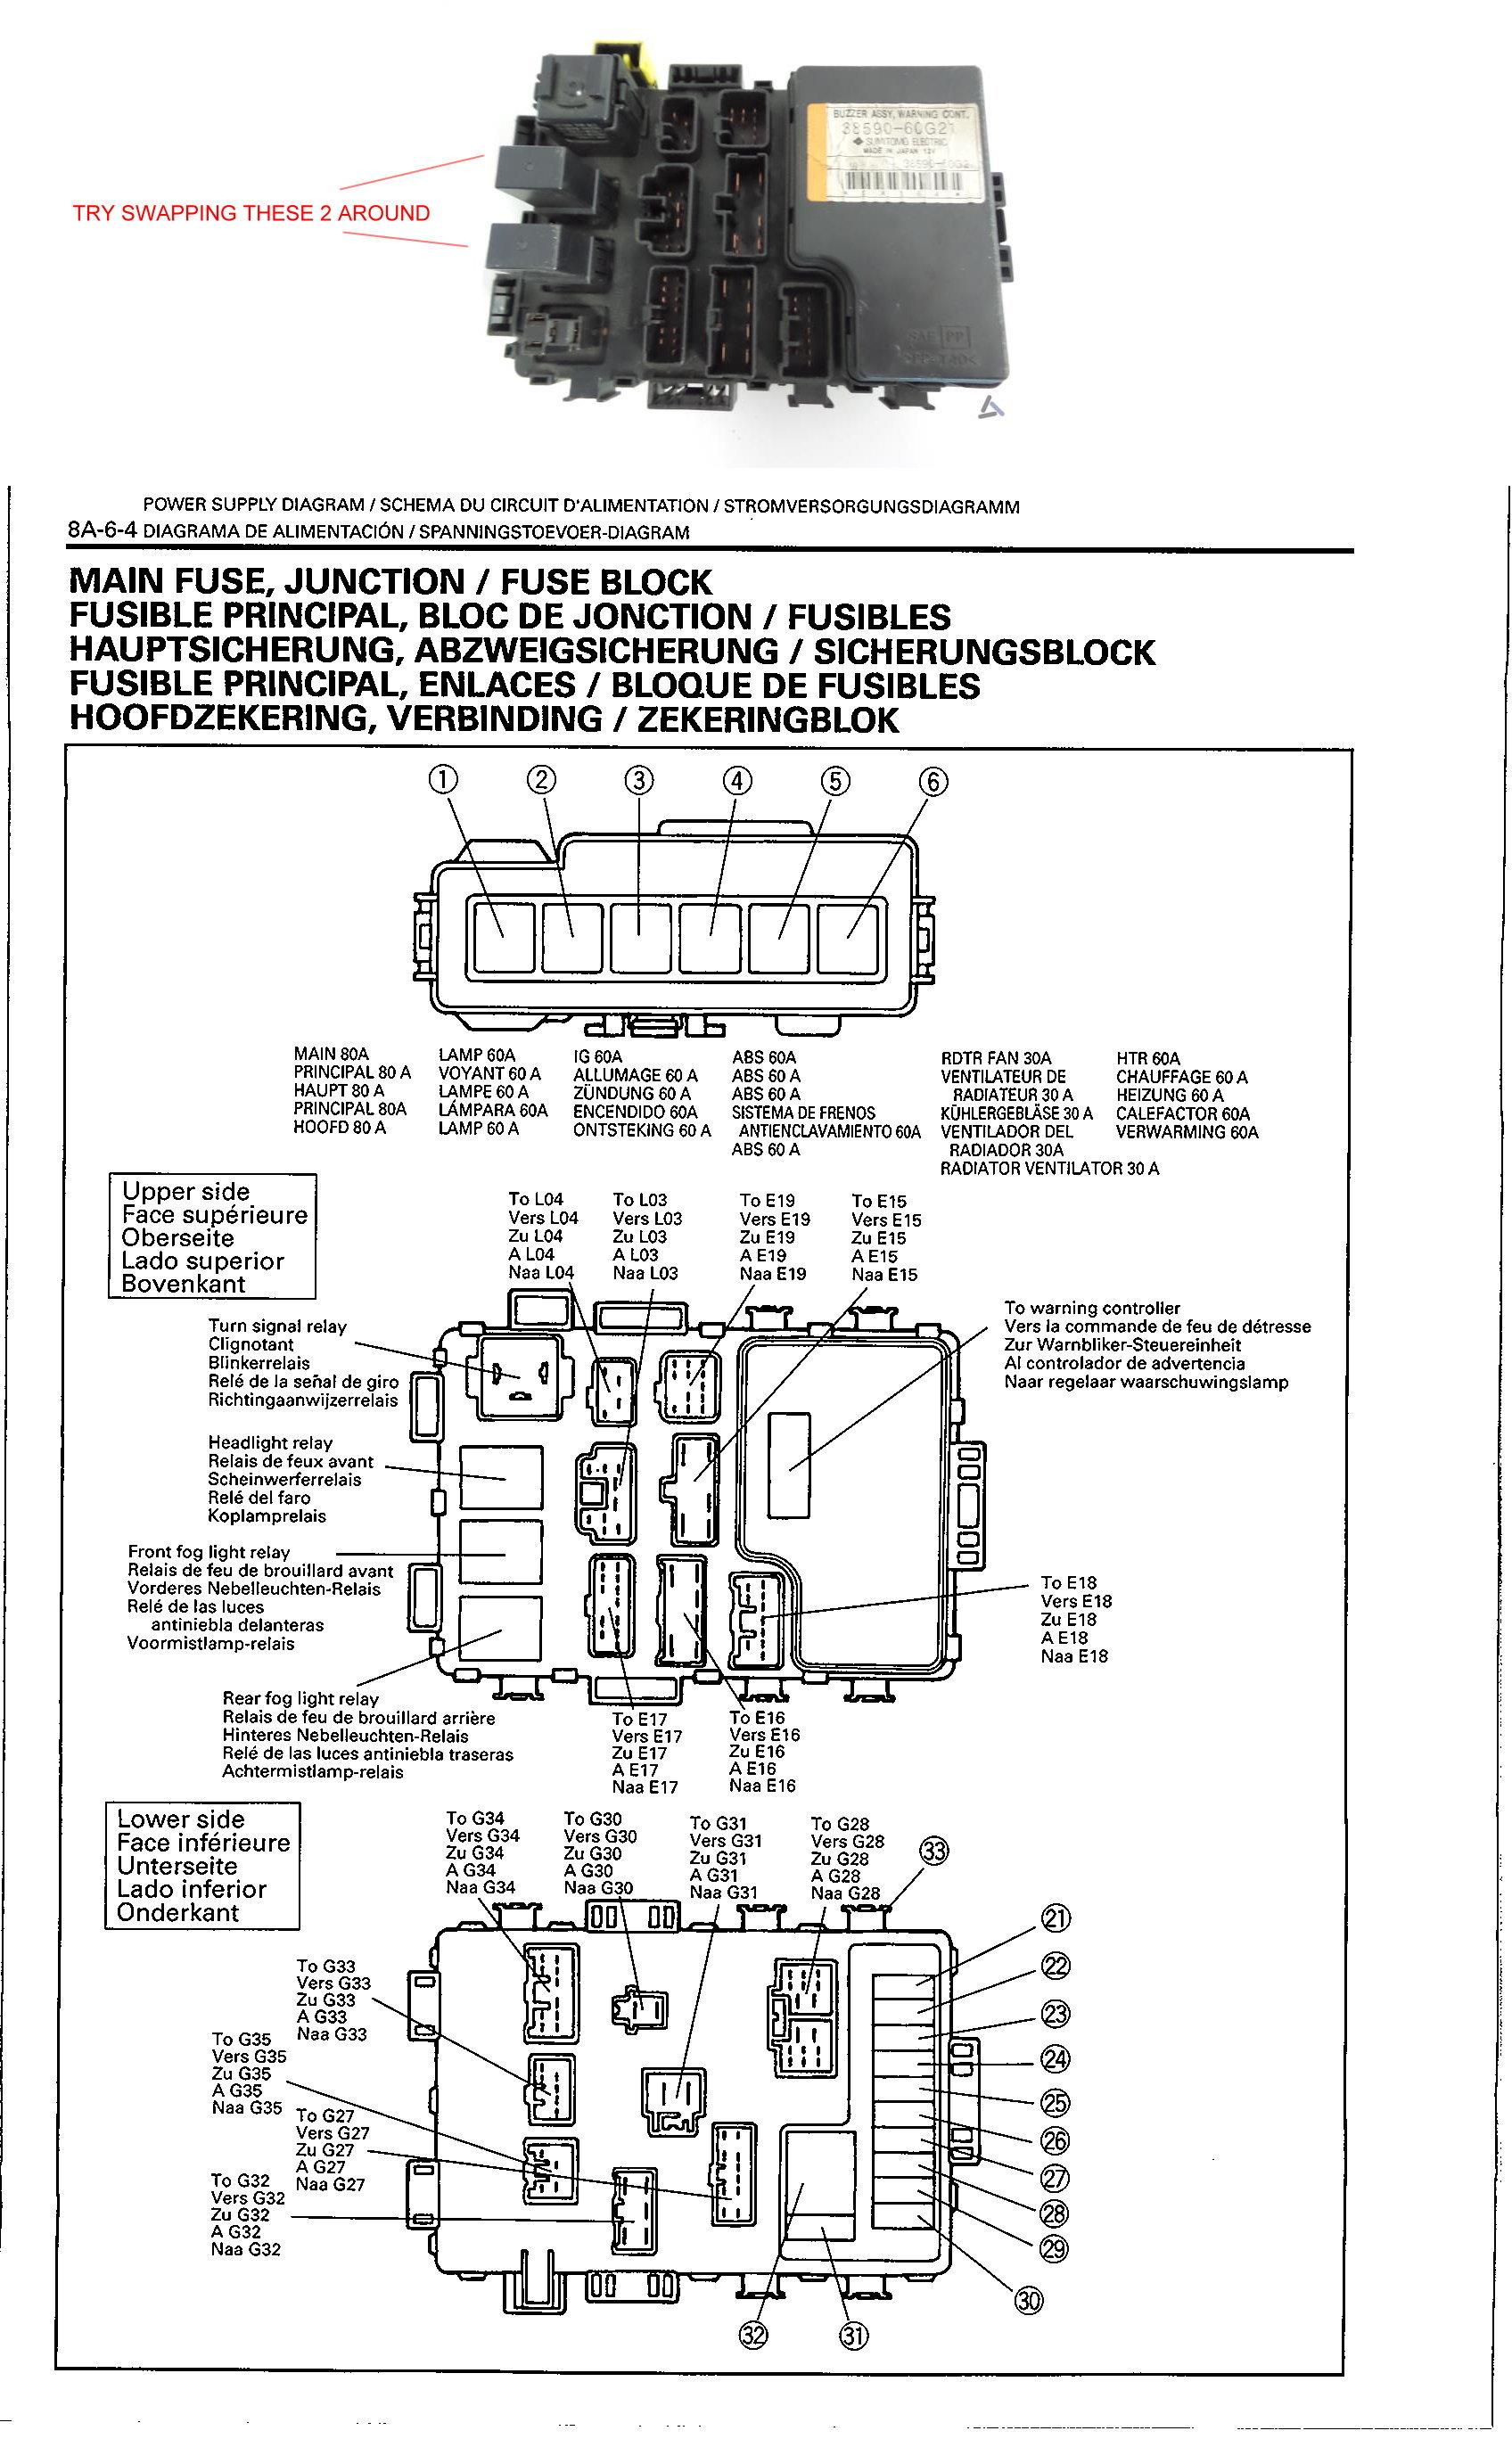 ZV_5953] Fuse Box Diagram Also Suzuki Samurai Wiring Diagram Further Suzuki  Free DiagramPneu Tivexi Venet Winn Tivexi Rdona Gue45 Mohammedshrine Librar Wiring 101